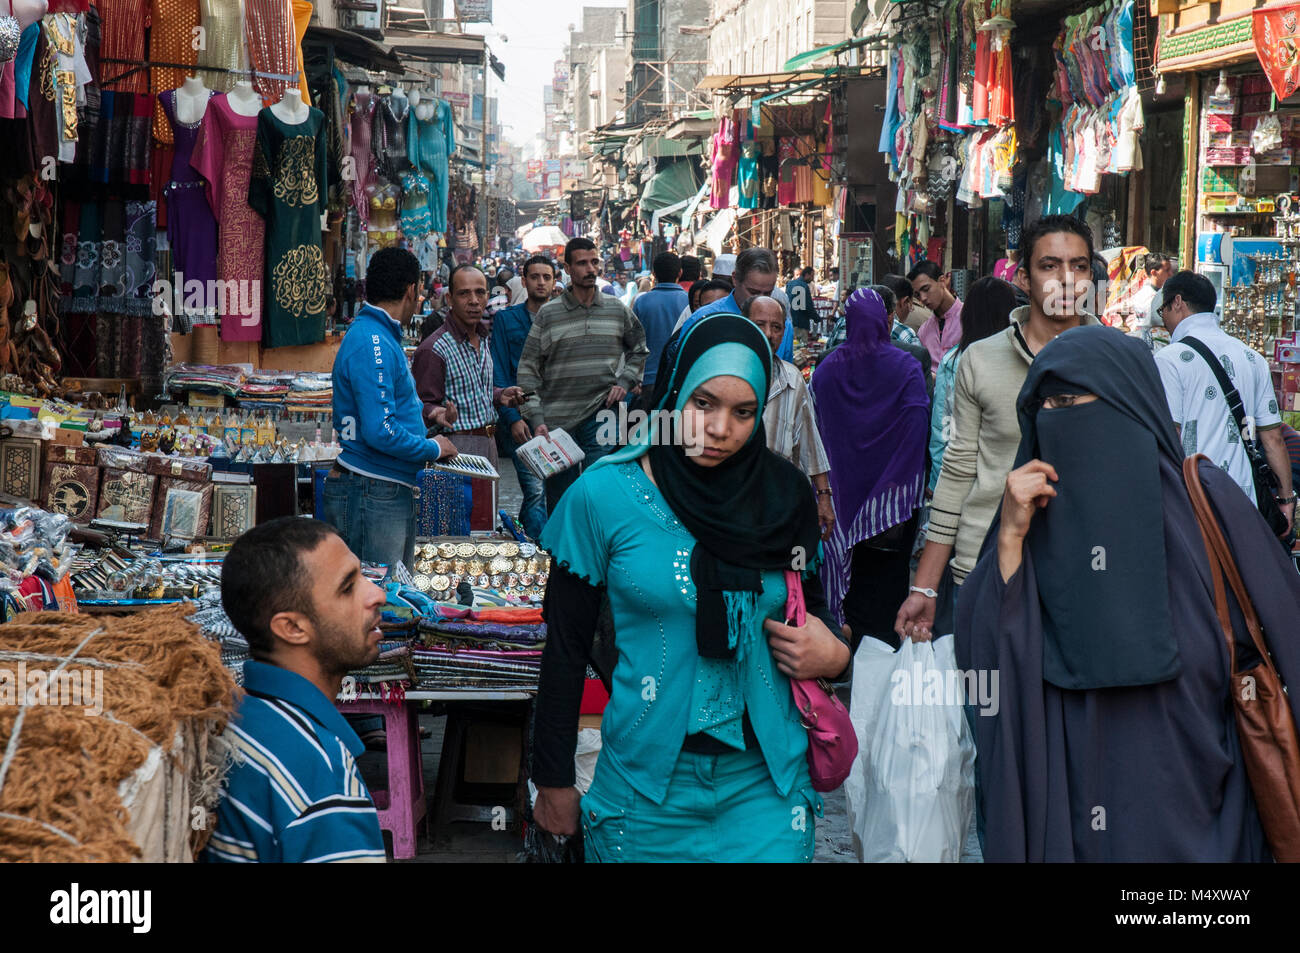 Street market along Muski in the Khan el-Khalili quarter of Islamic Cairo, Egypt - Stock Image